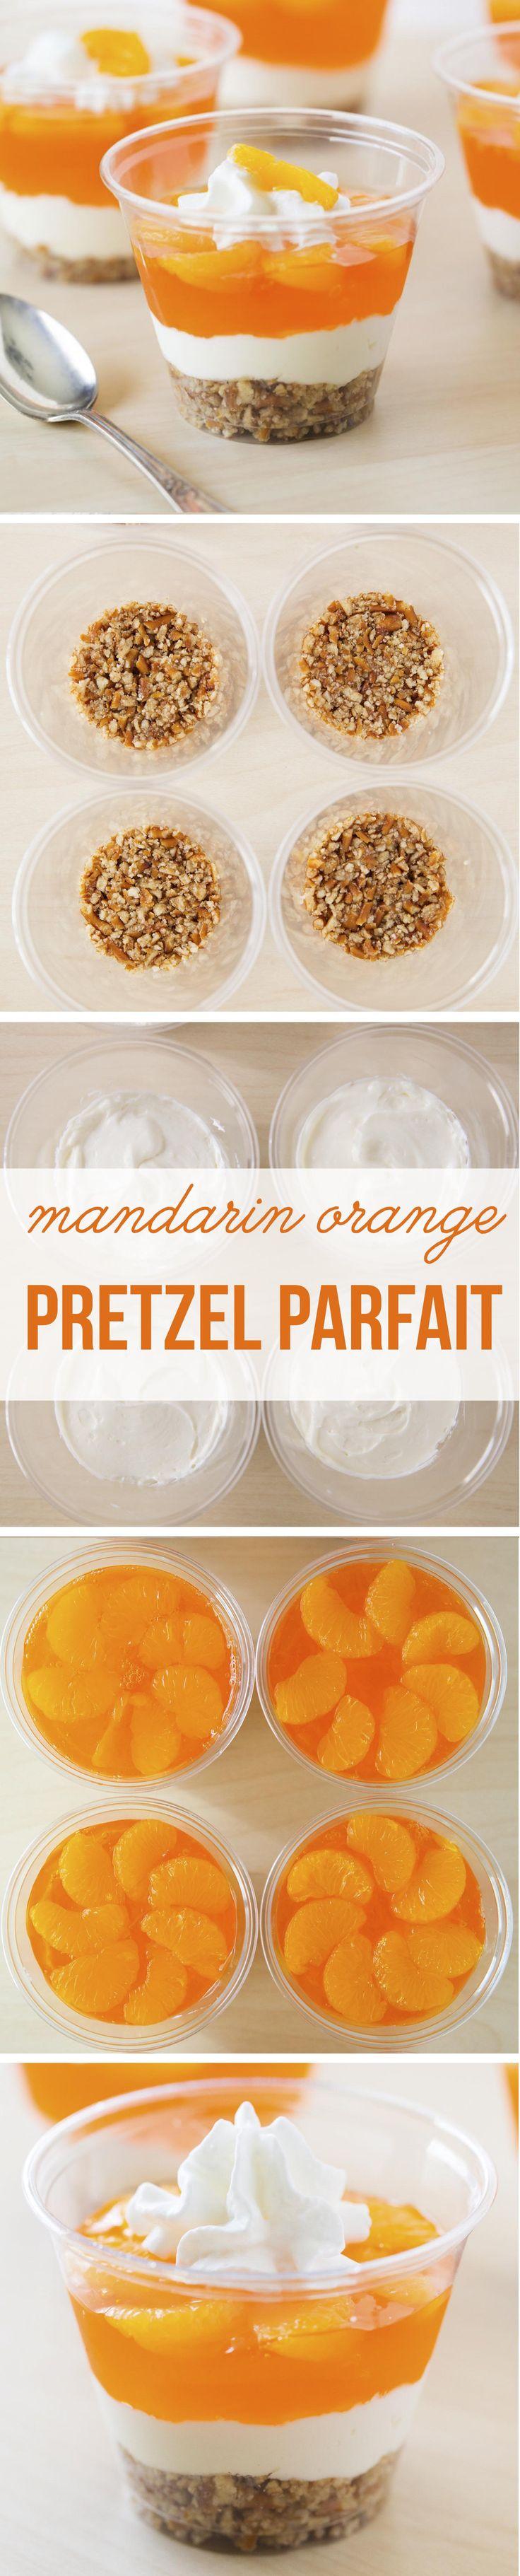 Easy no-bake mandarin orange pretzel parfaits made with mandarin oranges a pretzel crust and cheesecake filling!